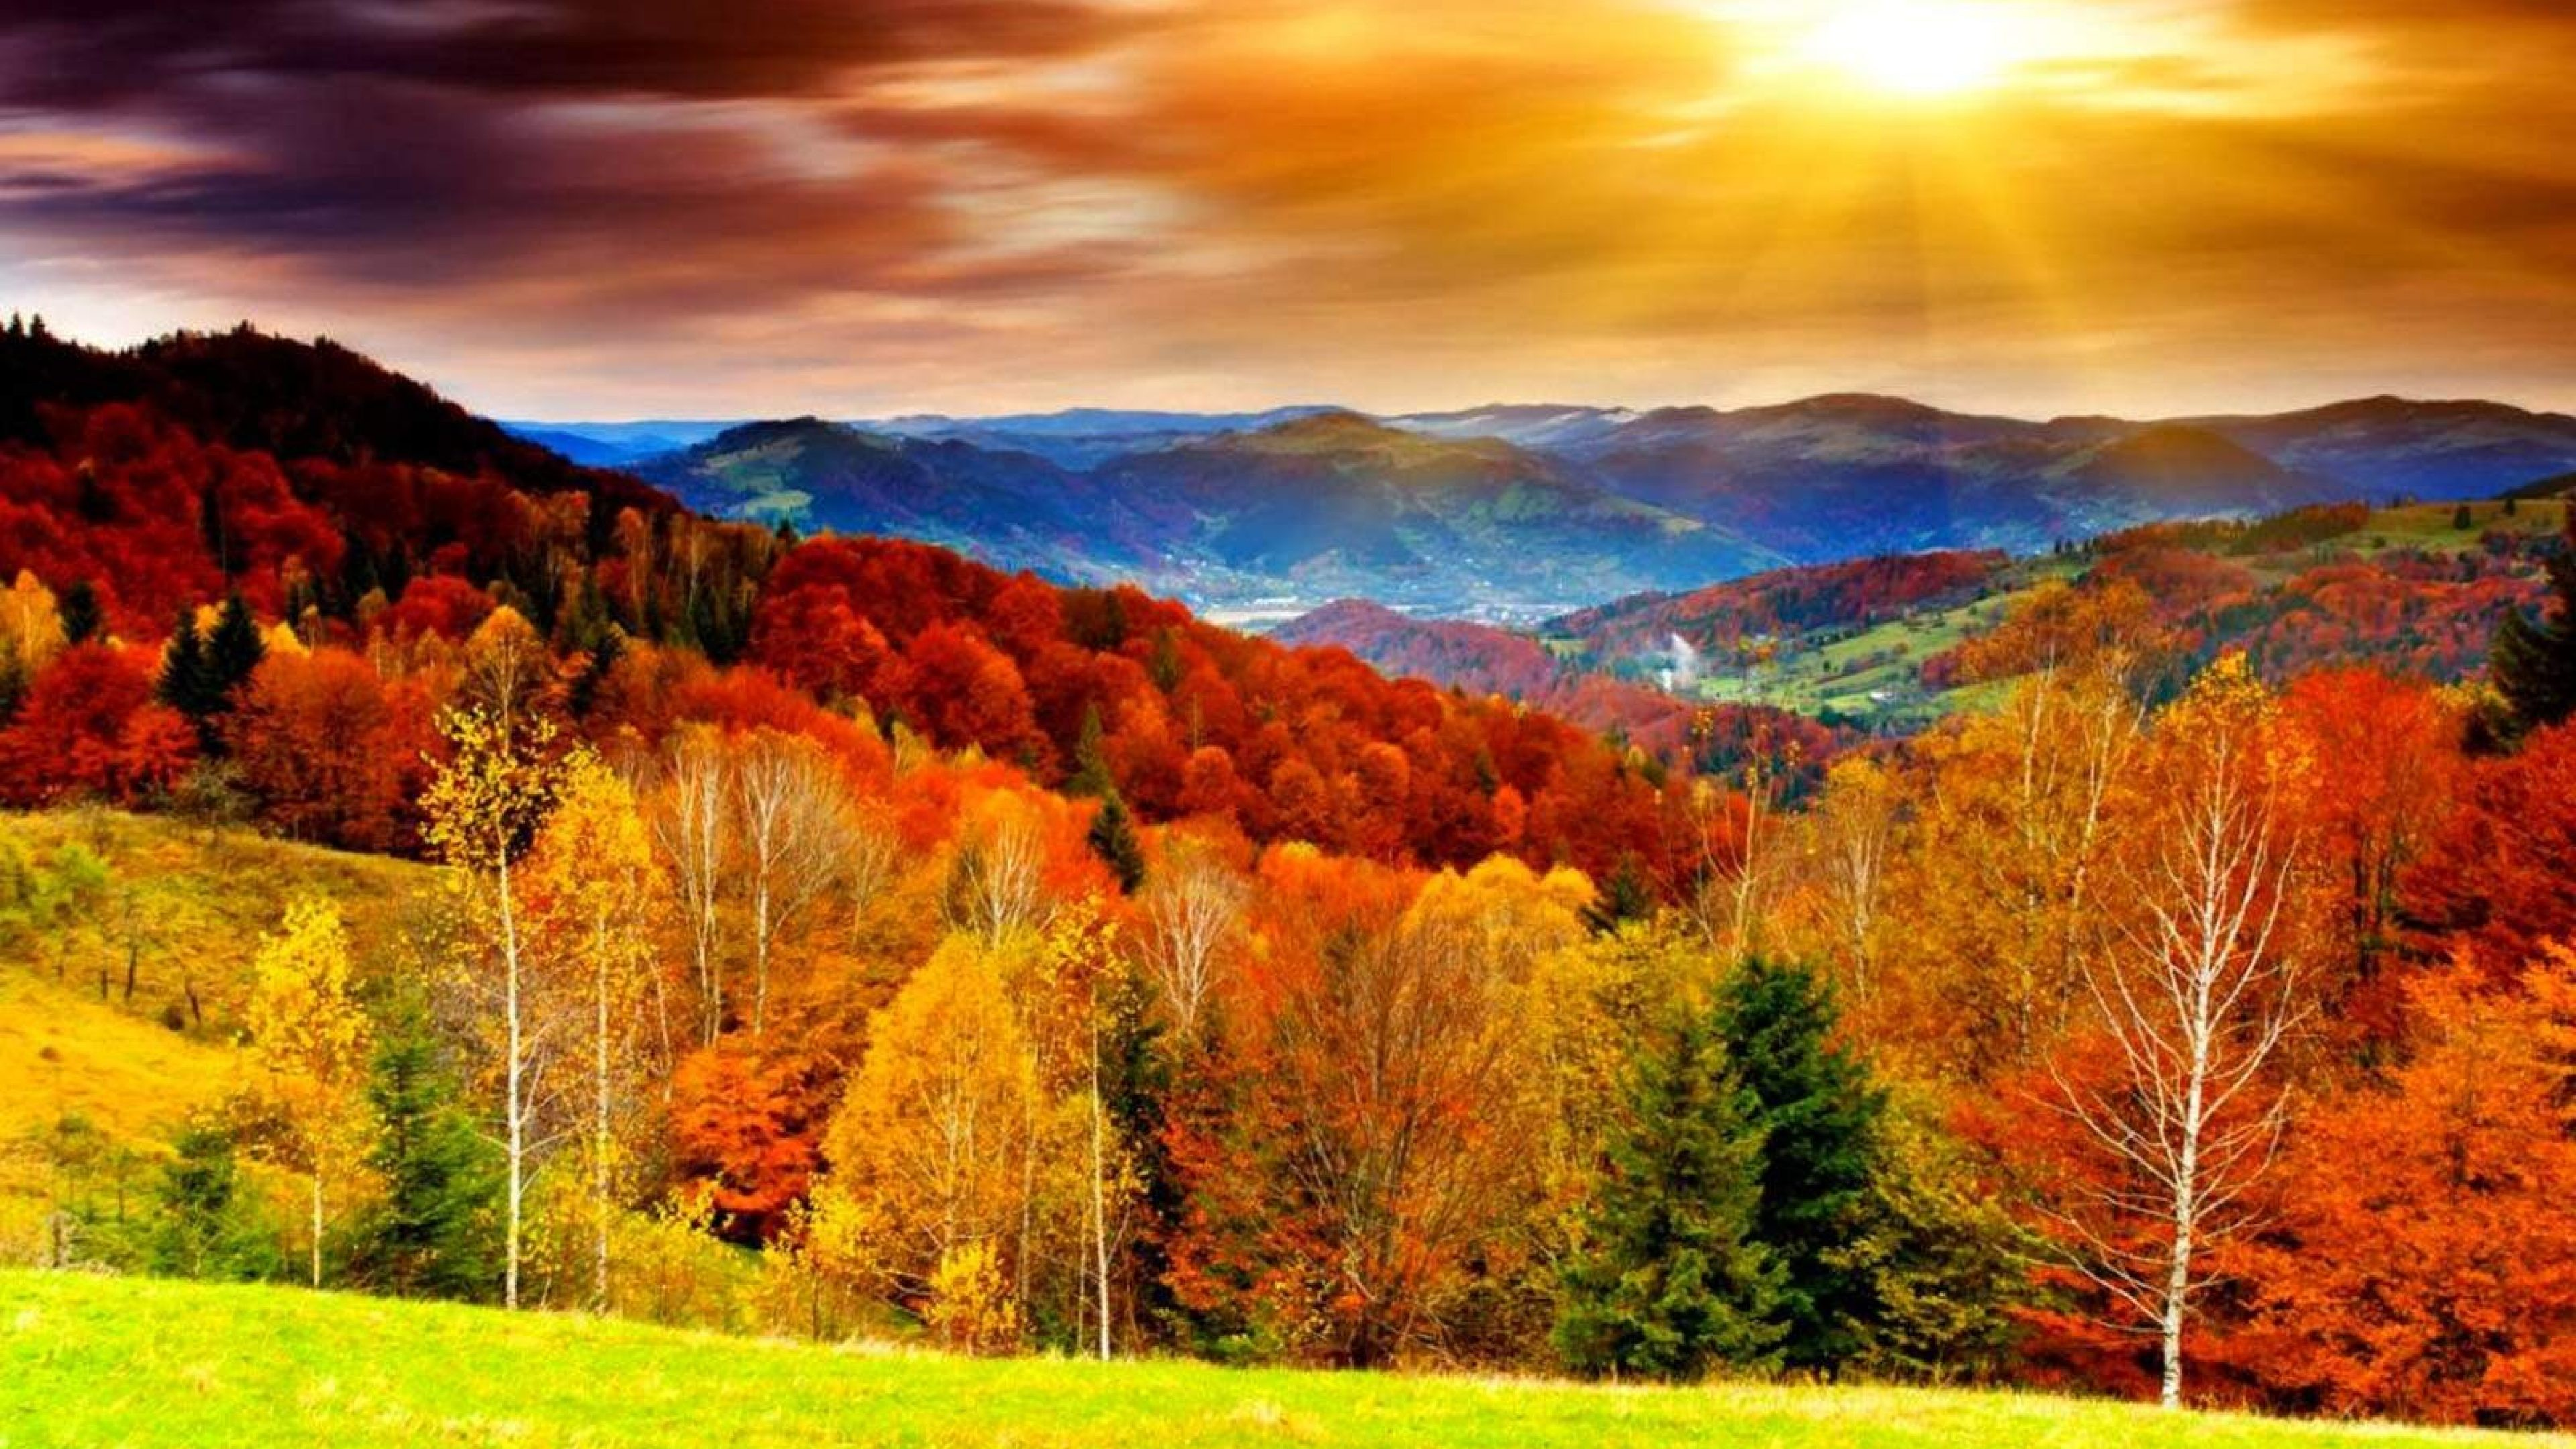 Free Autumn Desktop Screensavers: Autumn Desktop Wallpaper ·① Download Free Stunning Full HD